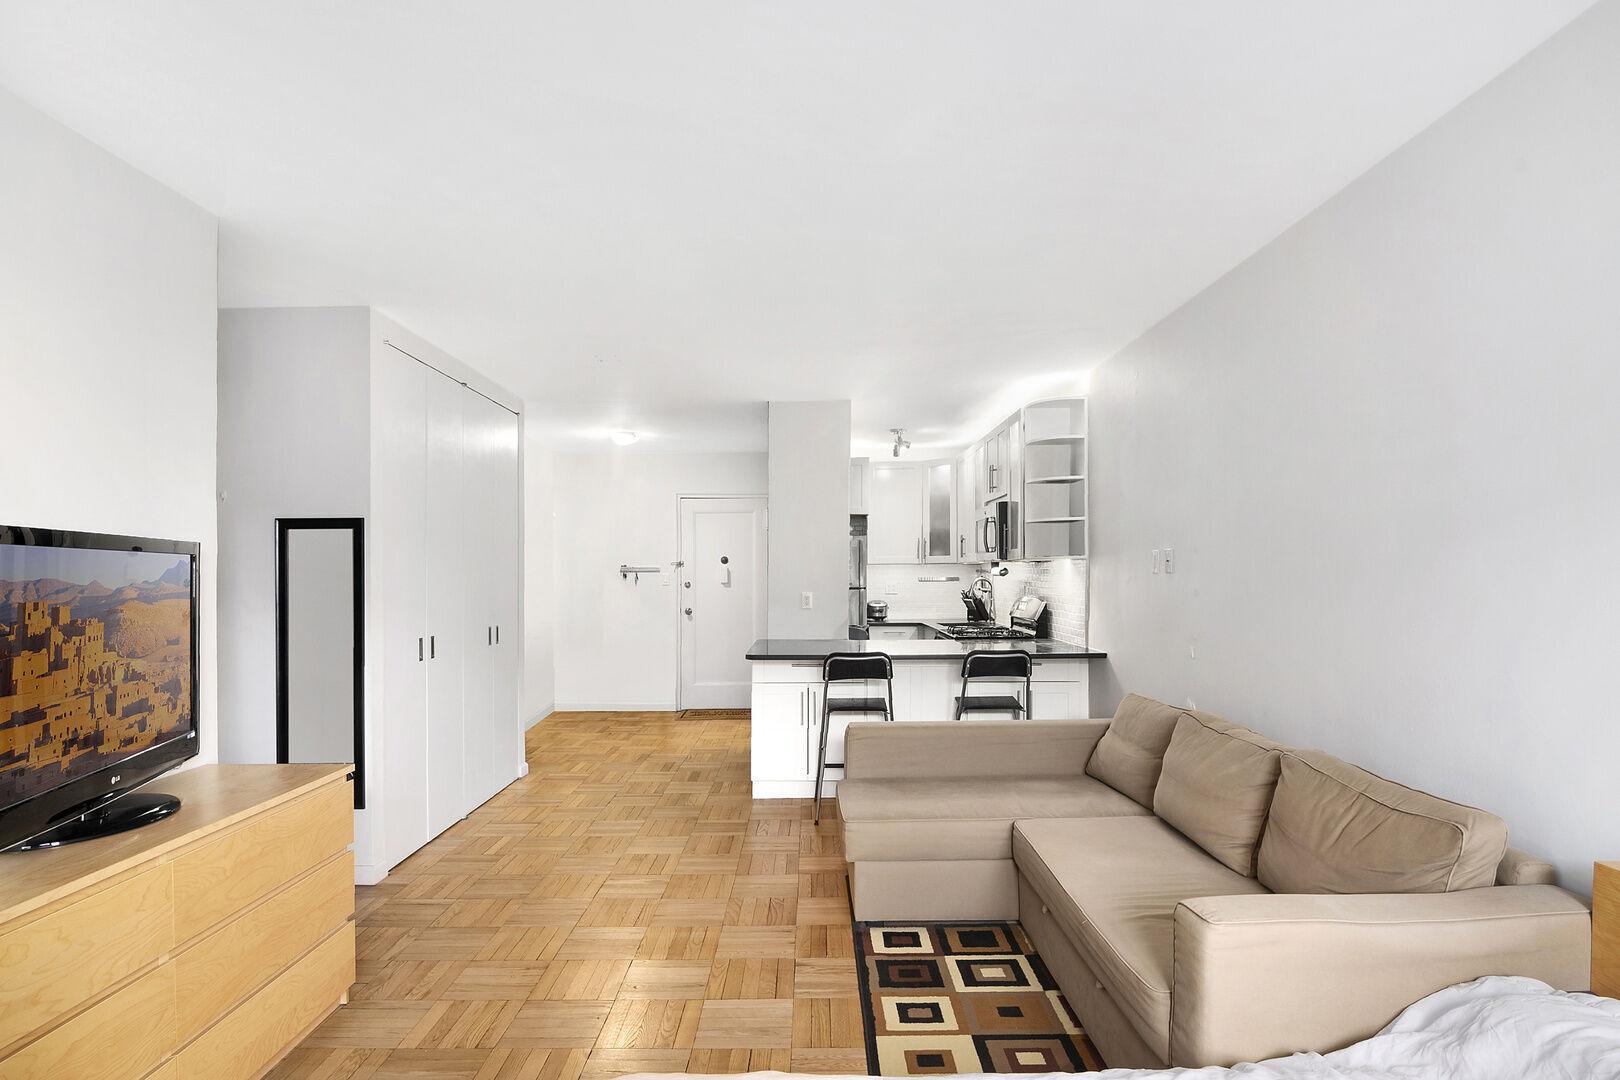 Apartment for sale at 110-45 Queens Blvd, Apt 607